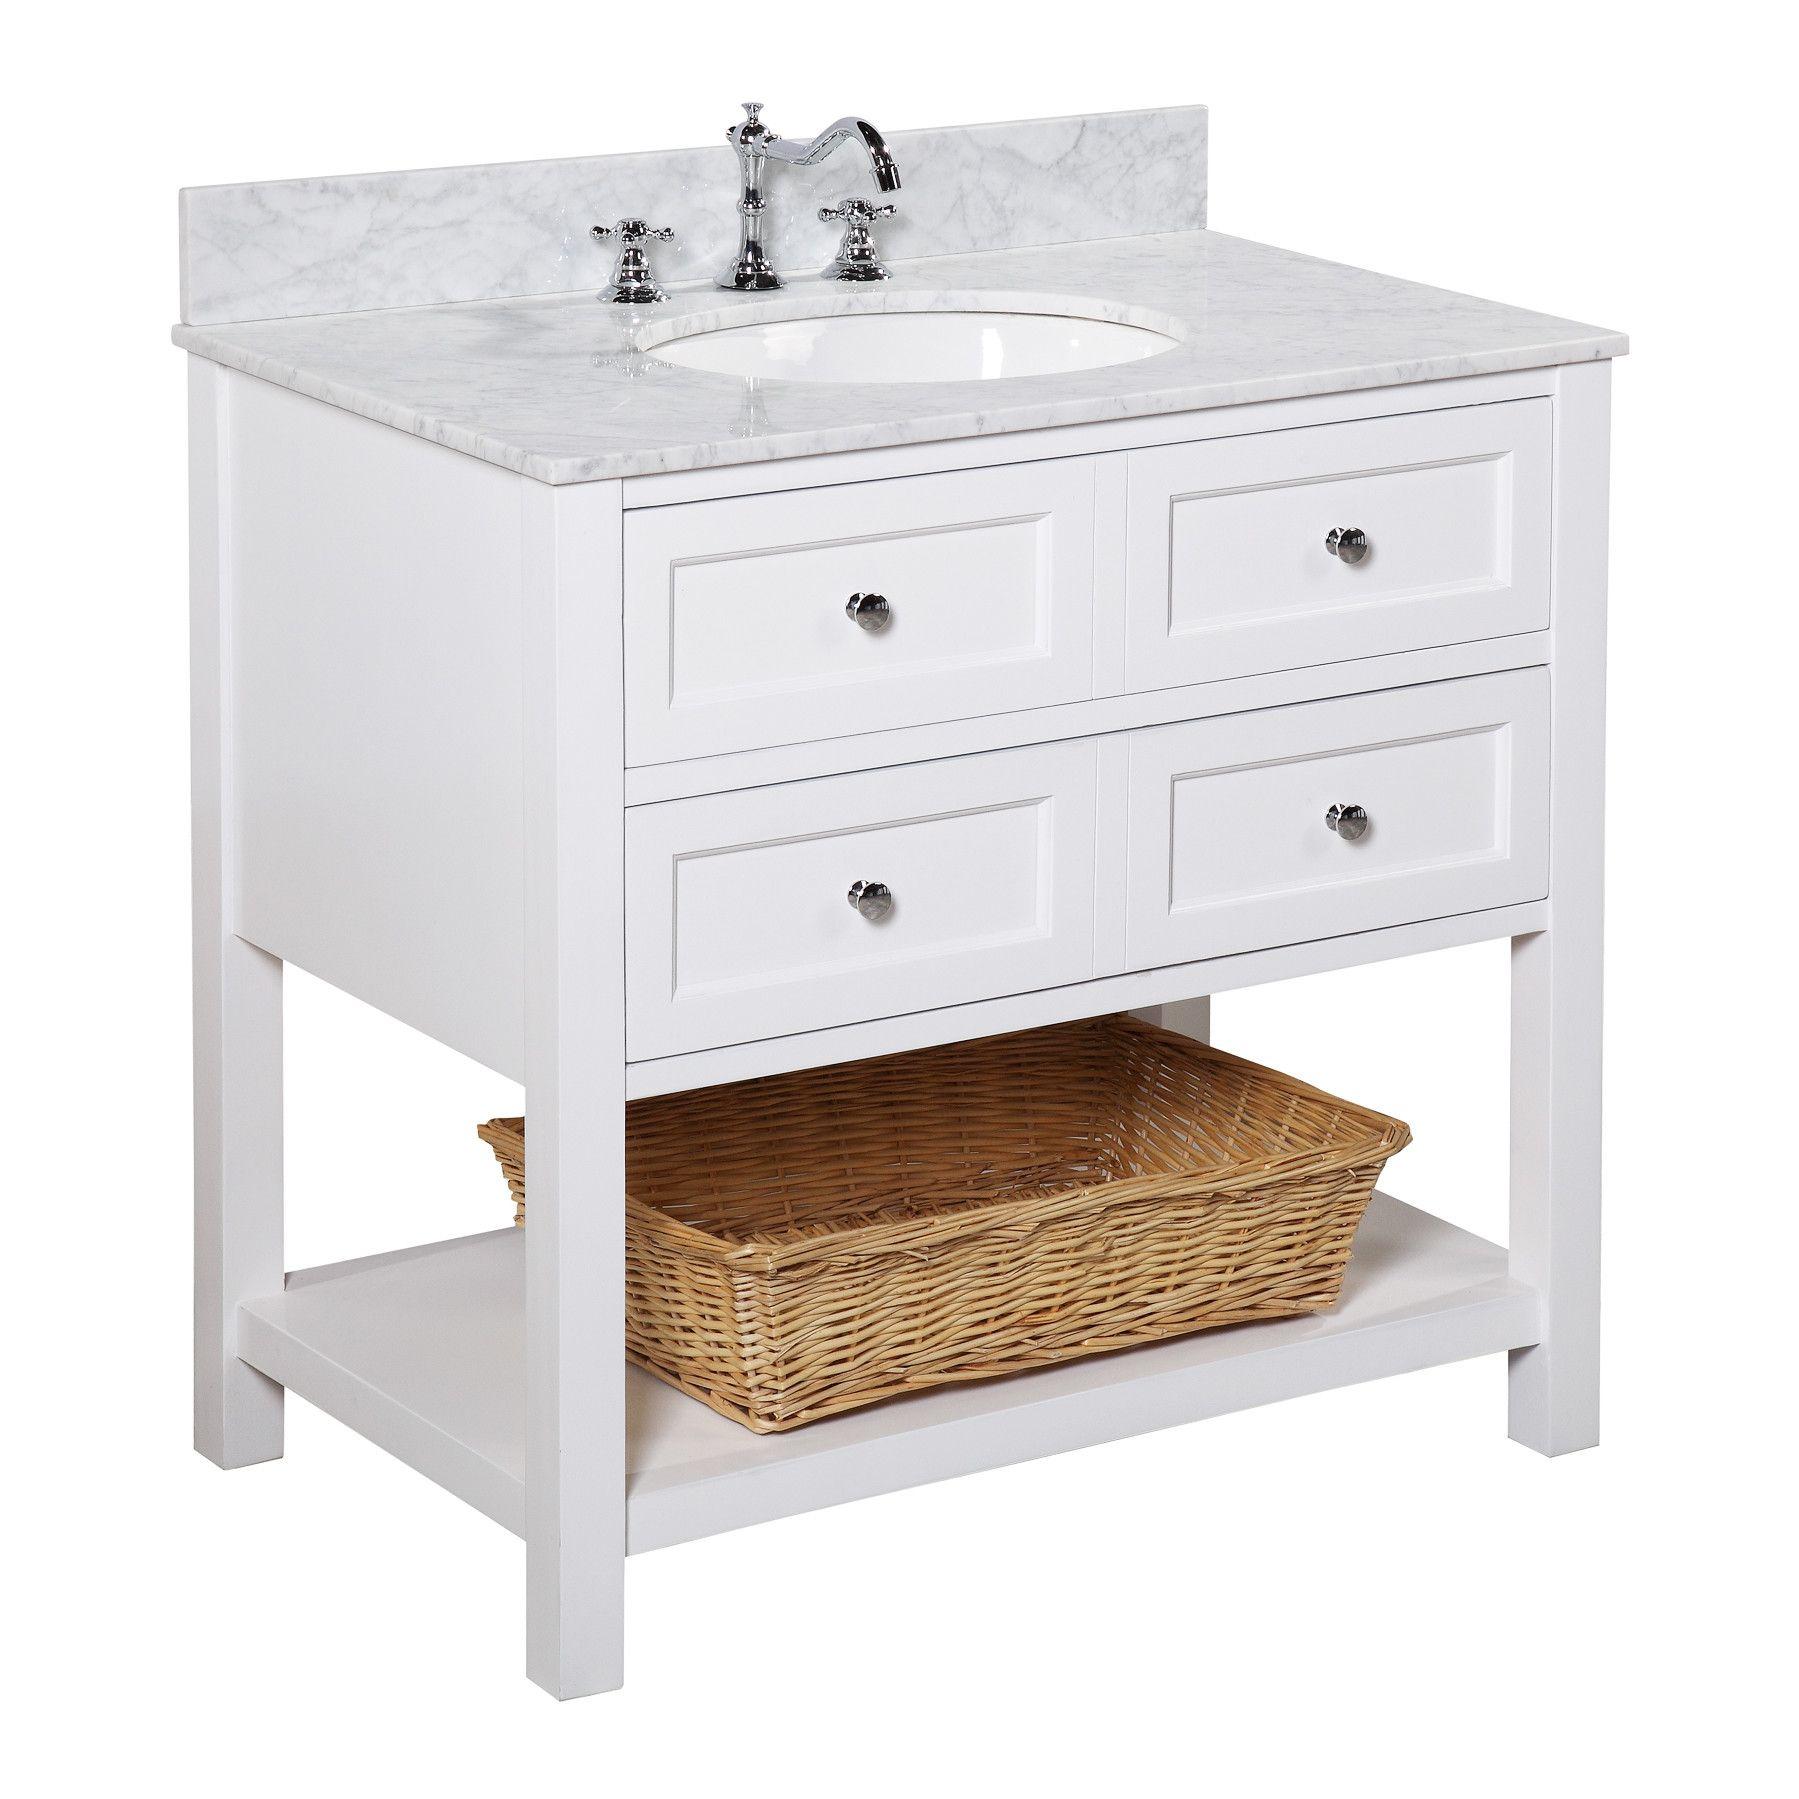 "Seadrift 37"" Single Bathroom Vanity Set 36 inch bathroom"